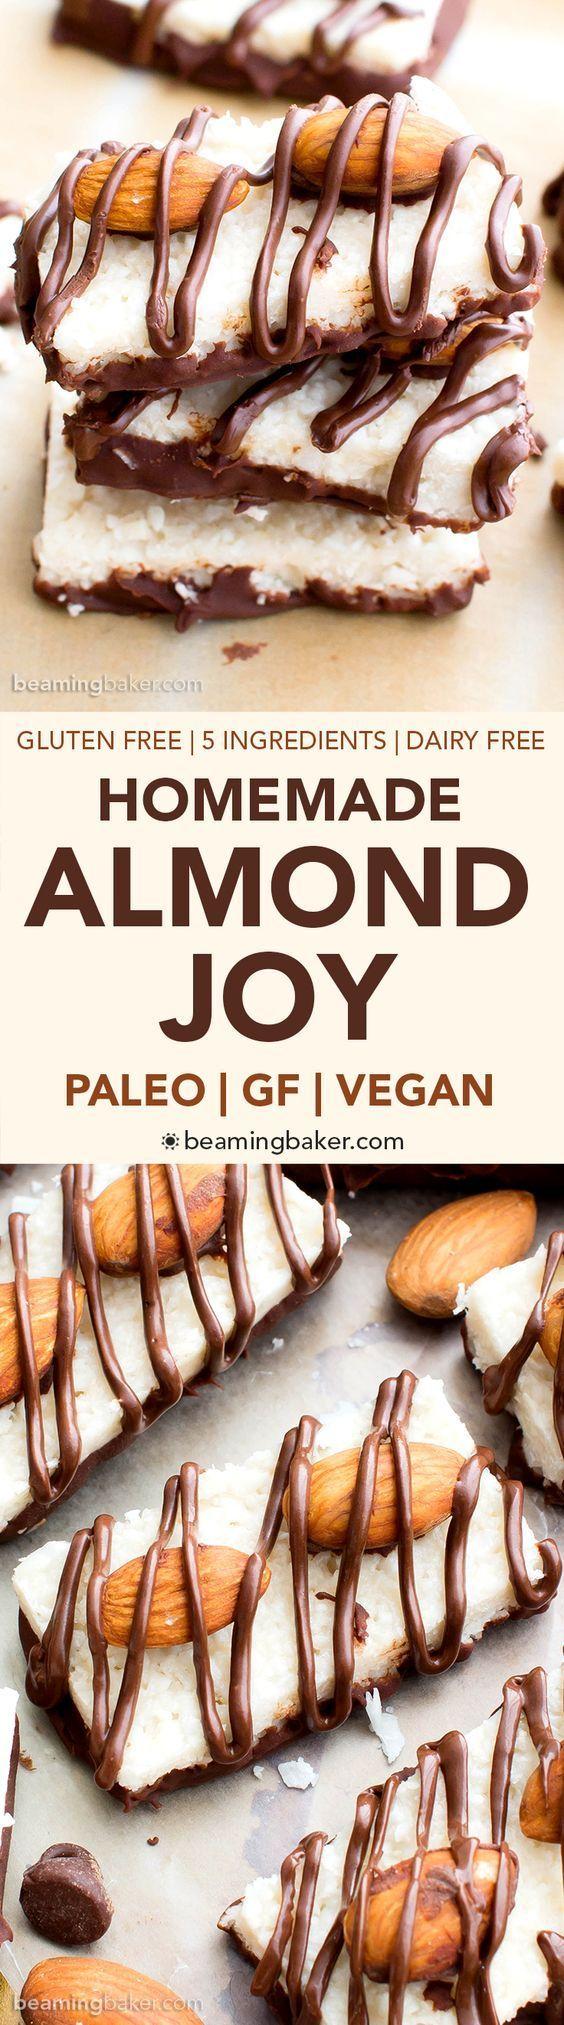 Paleo Almond Joy 5 Ingredient Recipe For Deliciously Satisfying